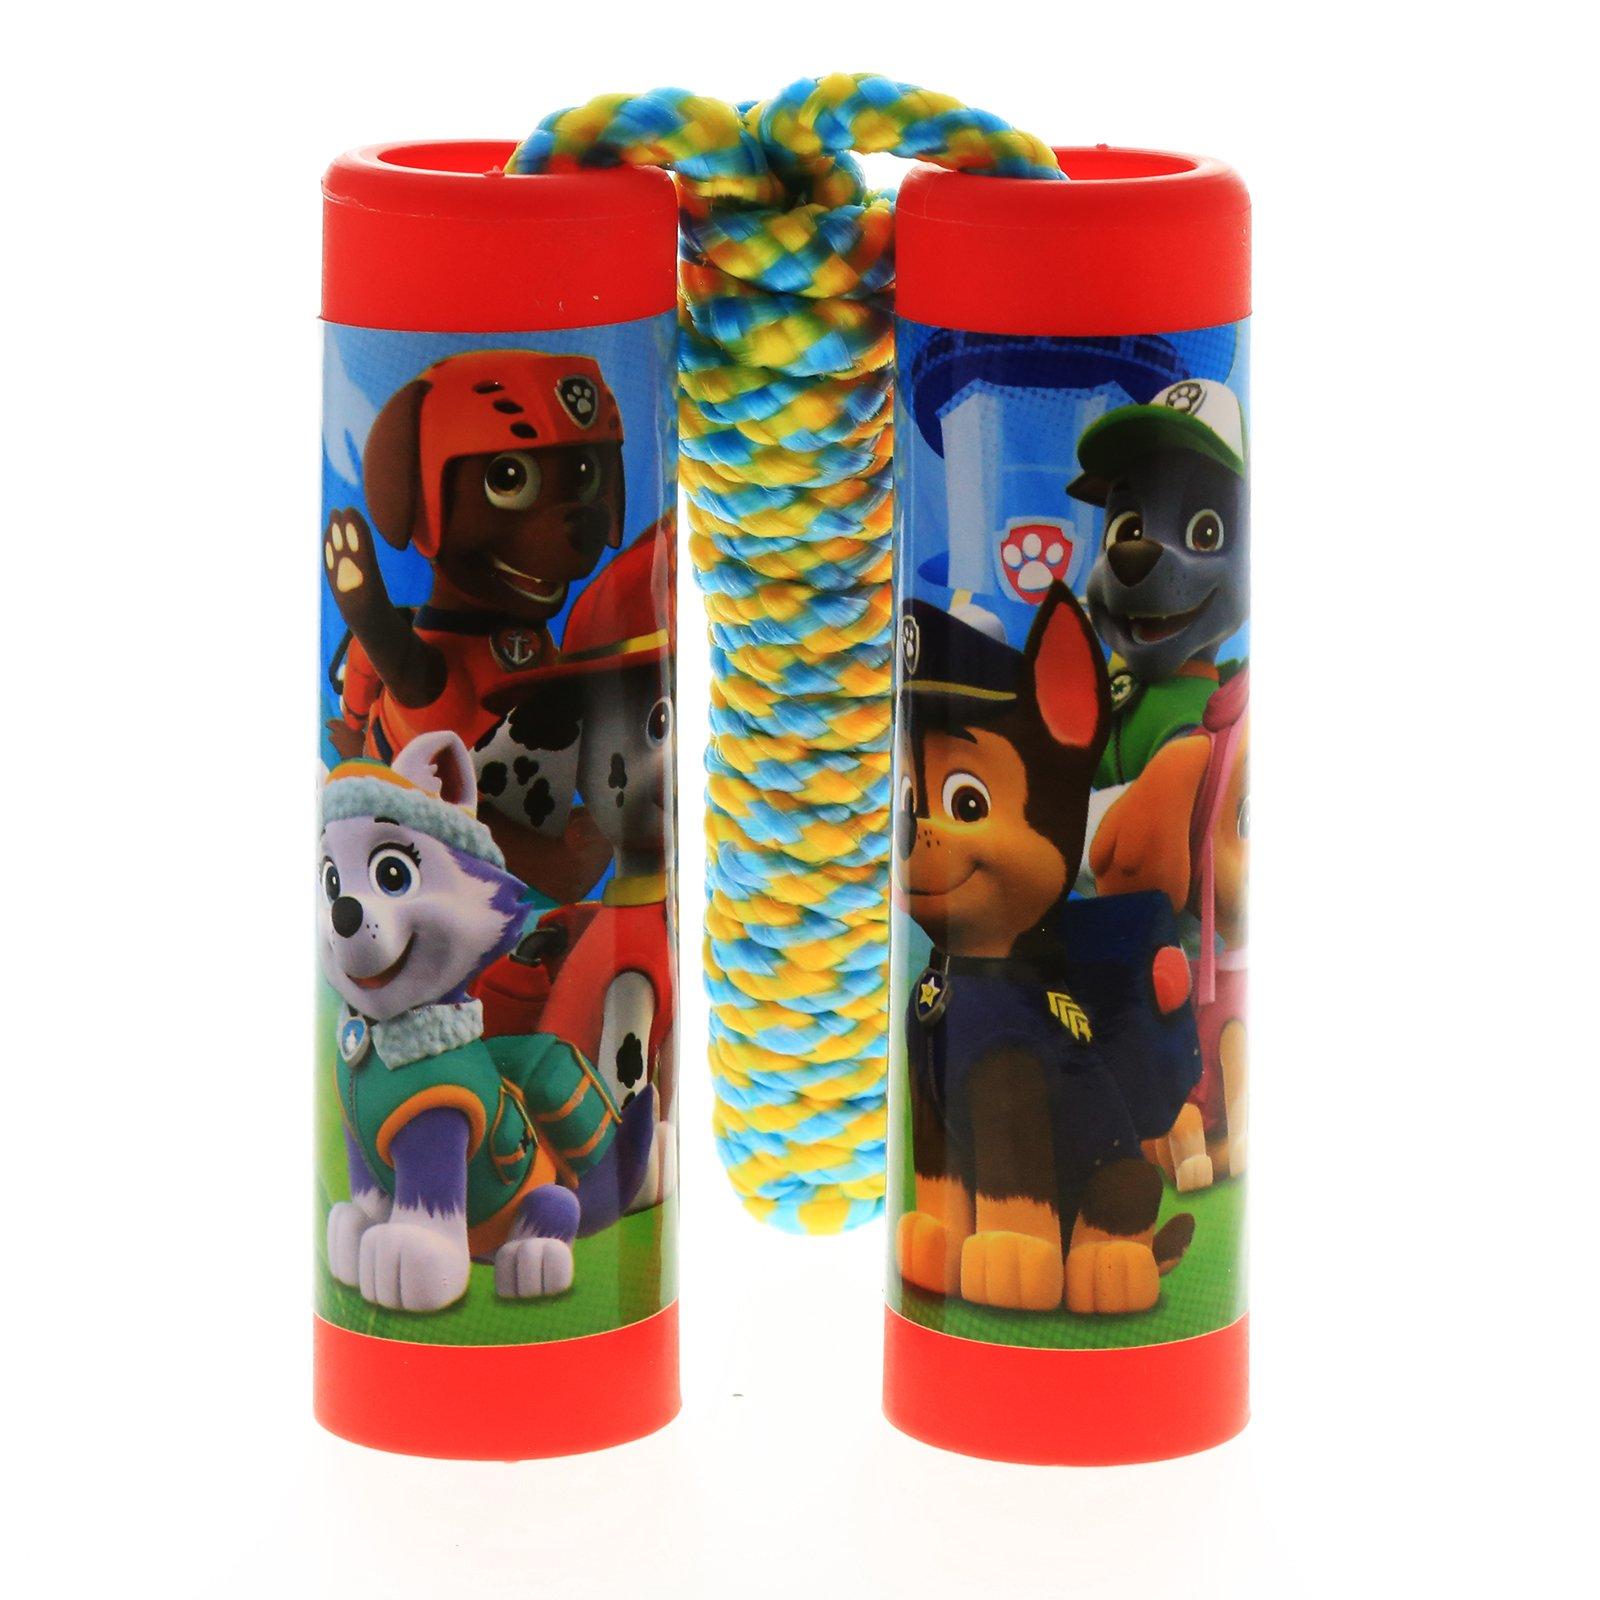 Nickelodeon Paw Patrol Jump Rope Kids Exercise Toy - Red